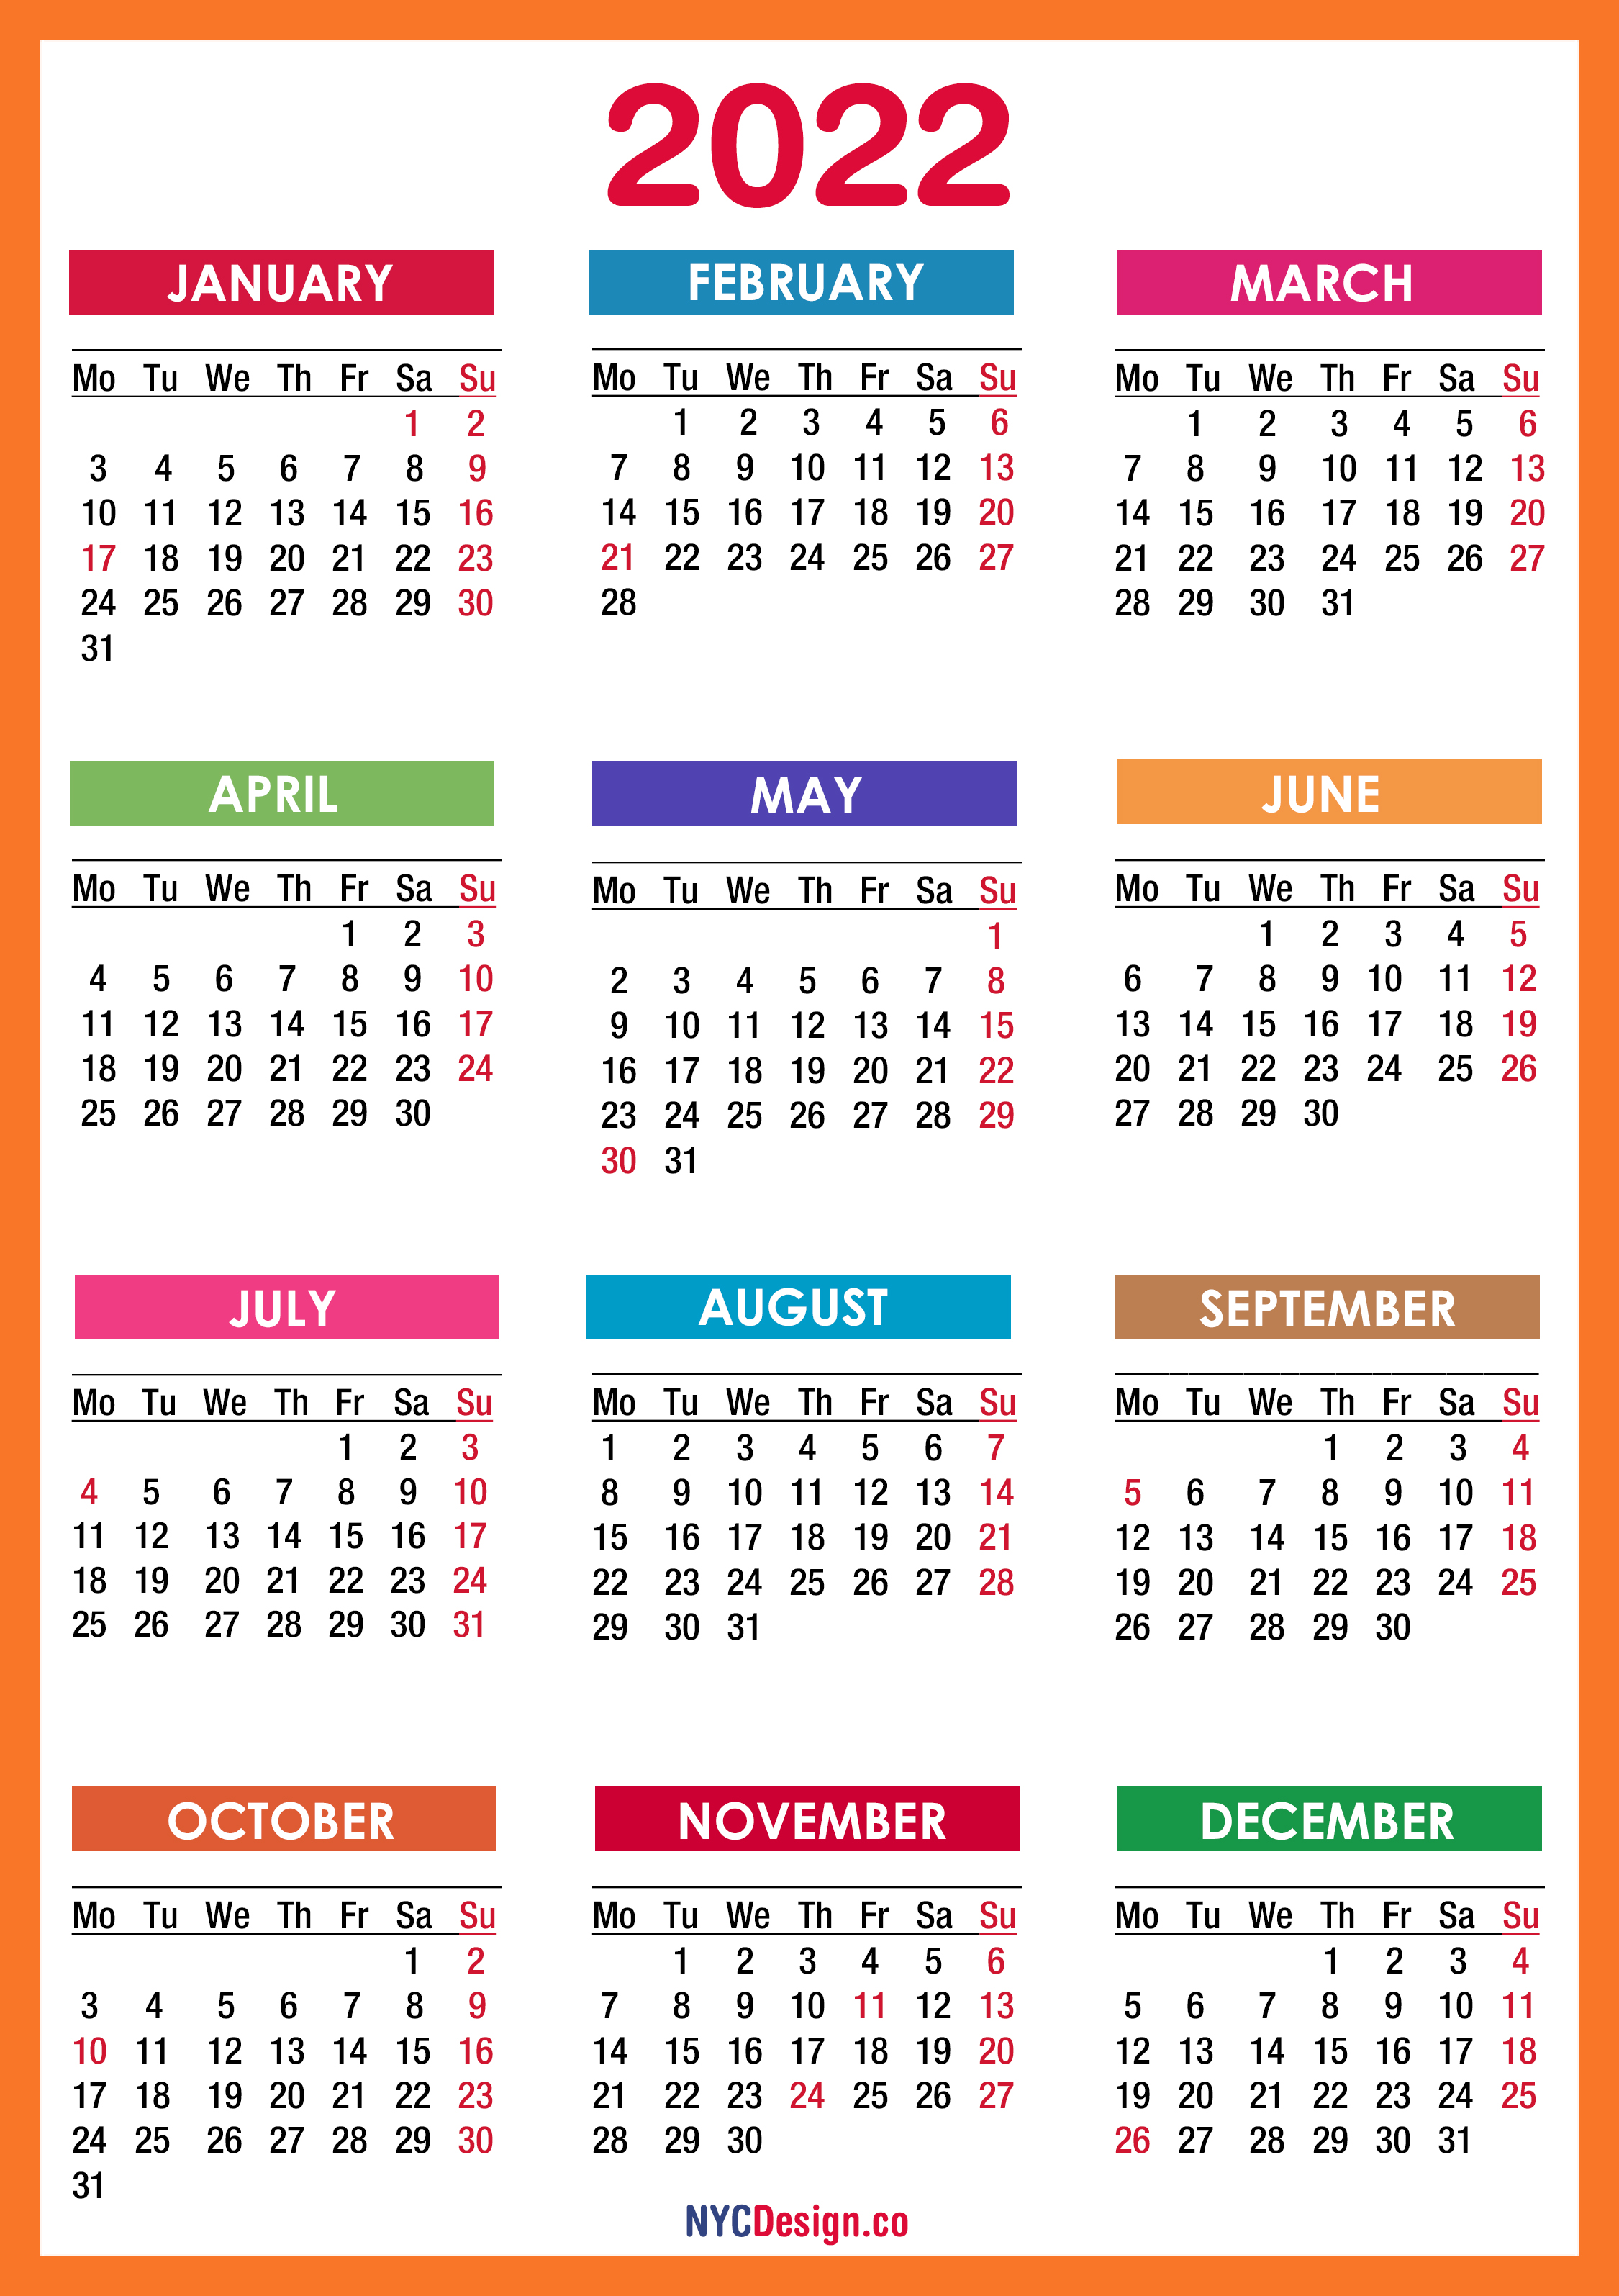 2022 Calendar Monday Start.2022 Calendar With Holidays Printable Free Pdf Colorful Red Orange Monday Start Nycdesign Co Calendars Printable Free